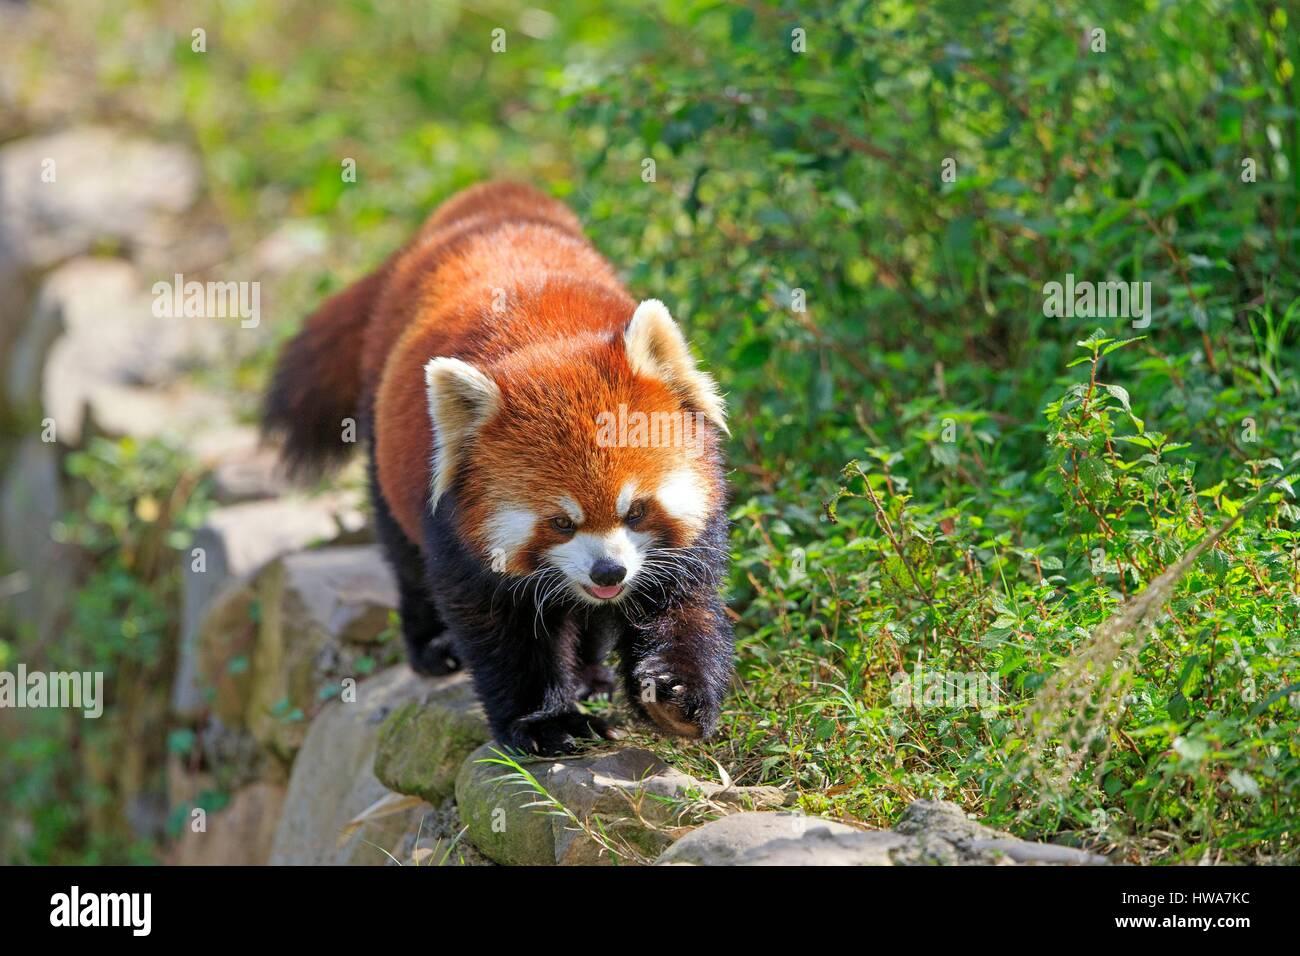 China, Sichuan, Research Base of Giant Panda Breeding or Chengdu Panda Base, Red Panda (Ailurus fulgens), captive Stock Photo